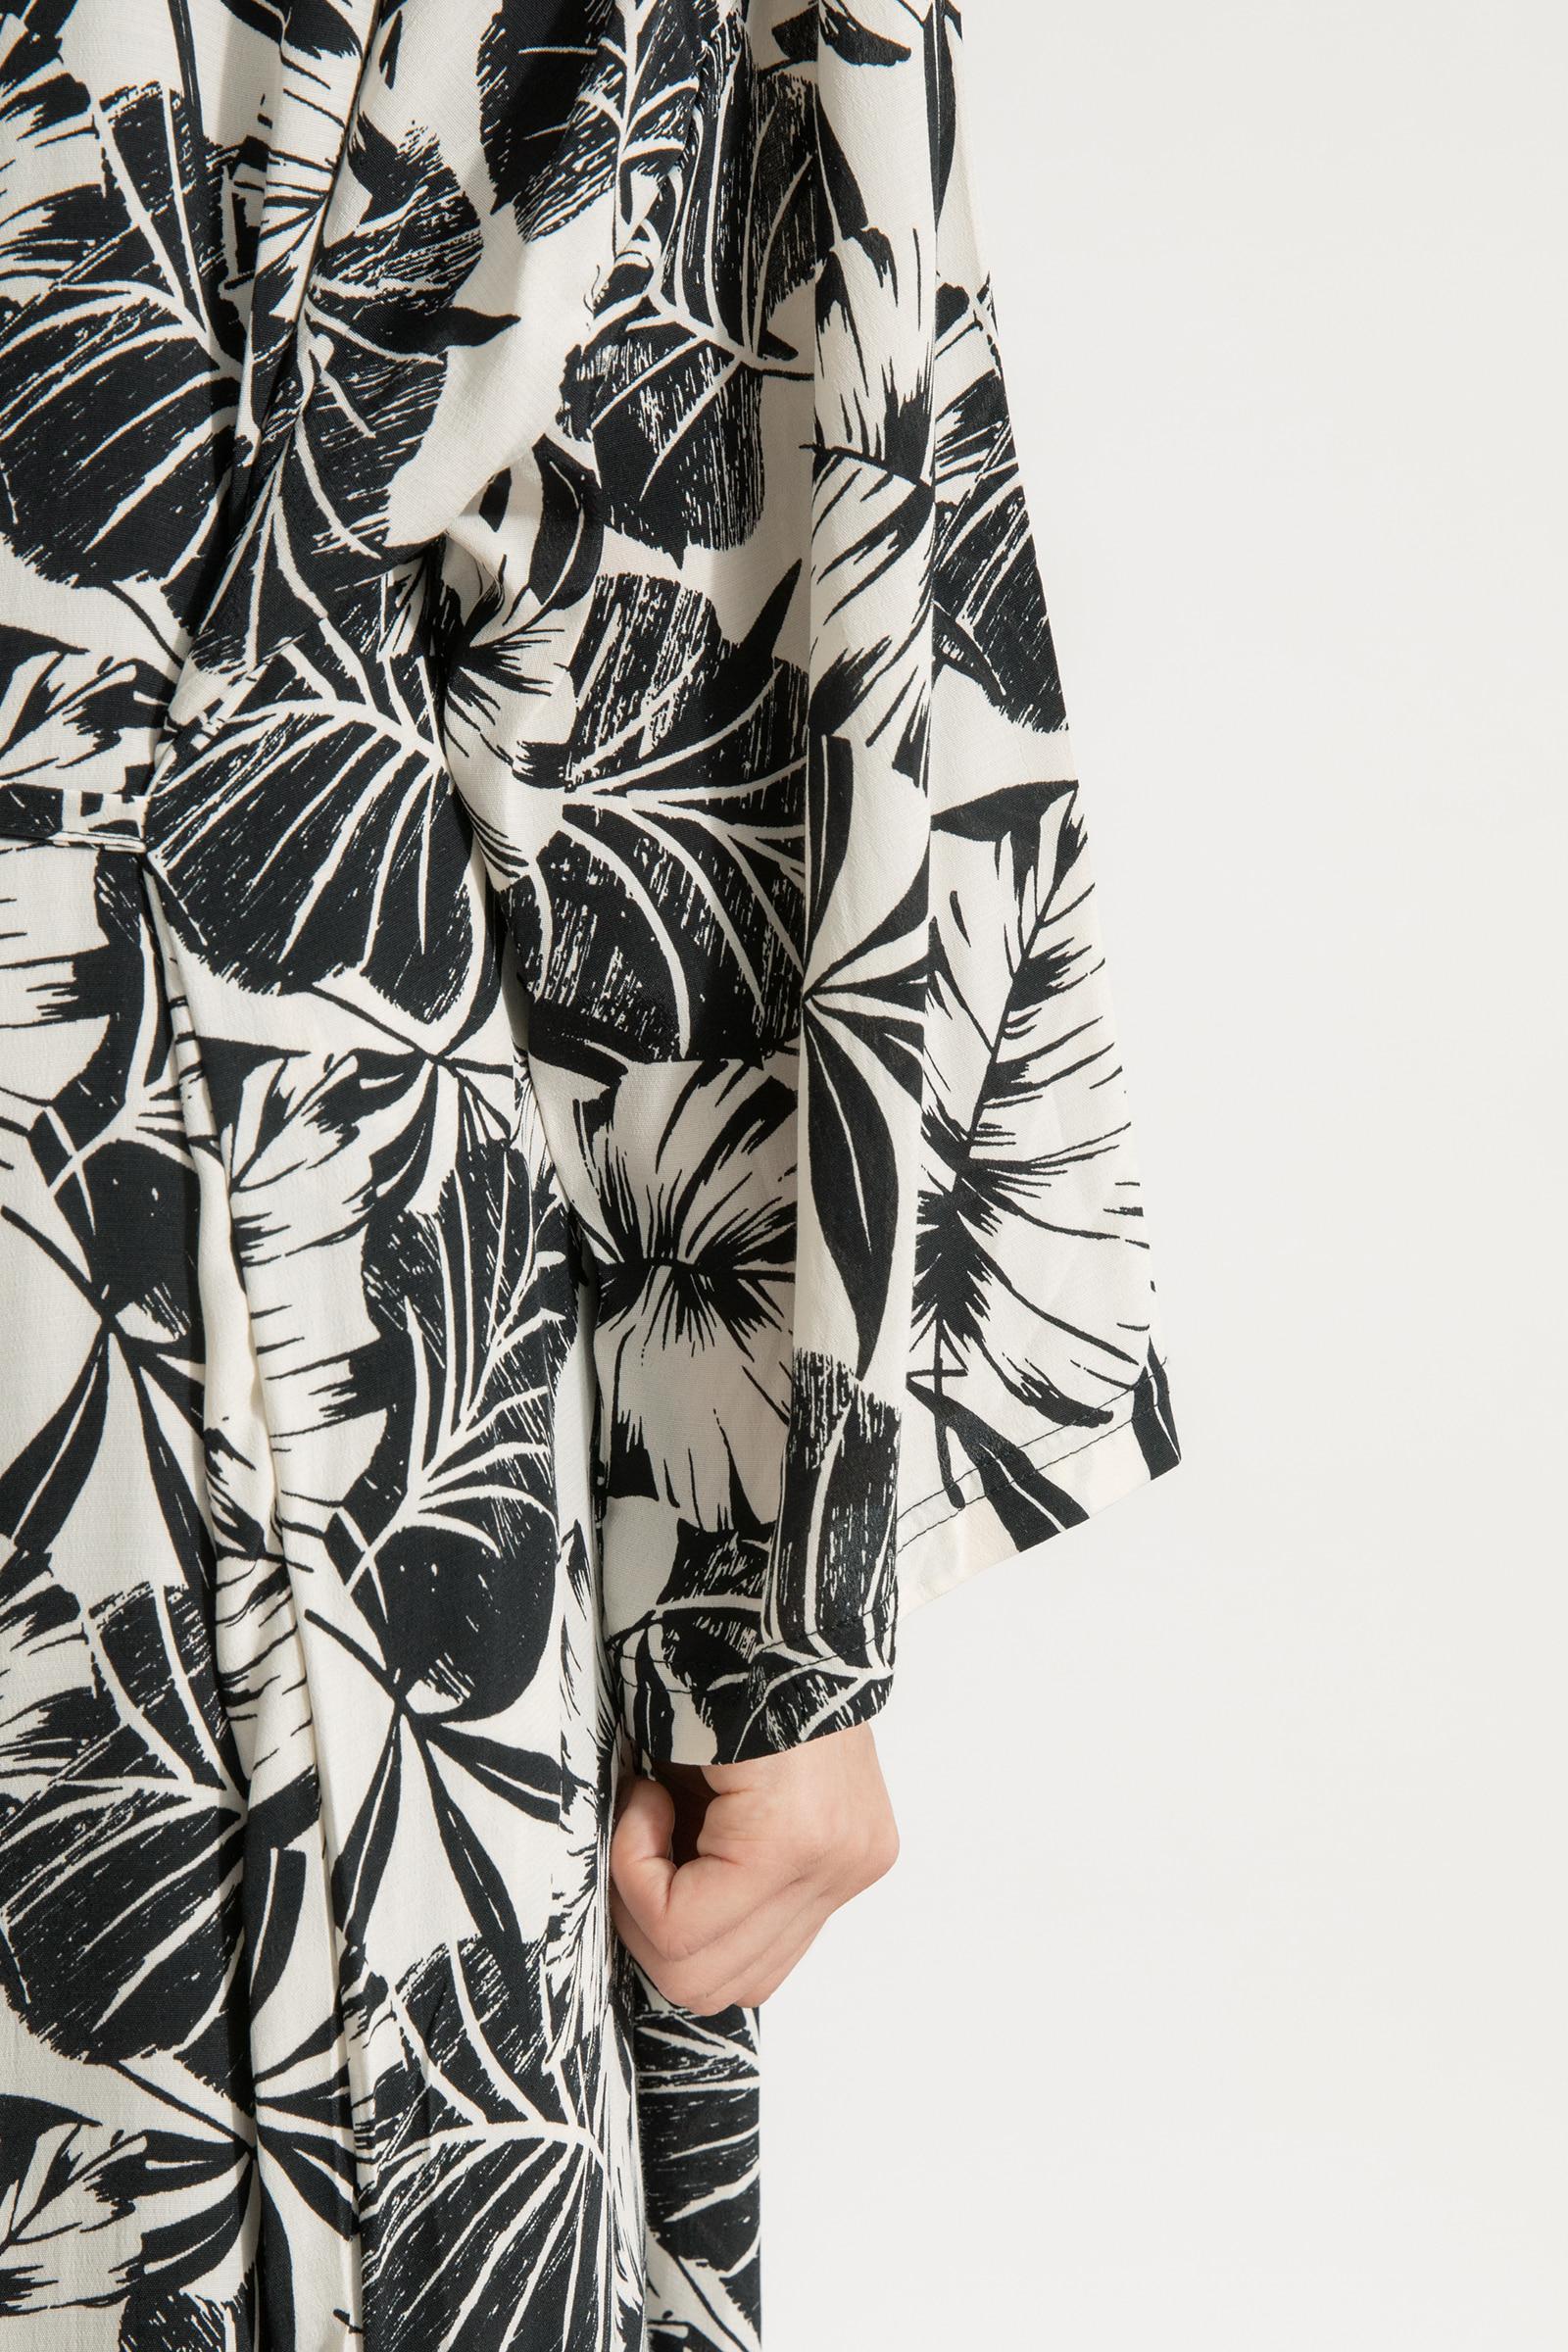 Summer pattern over long robe